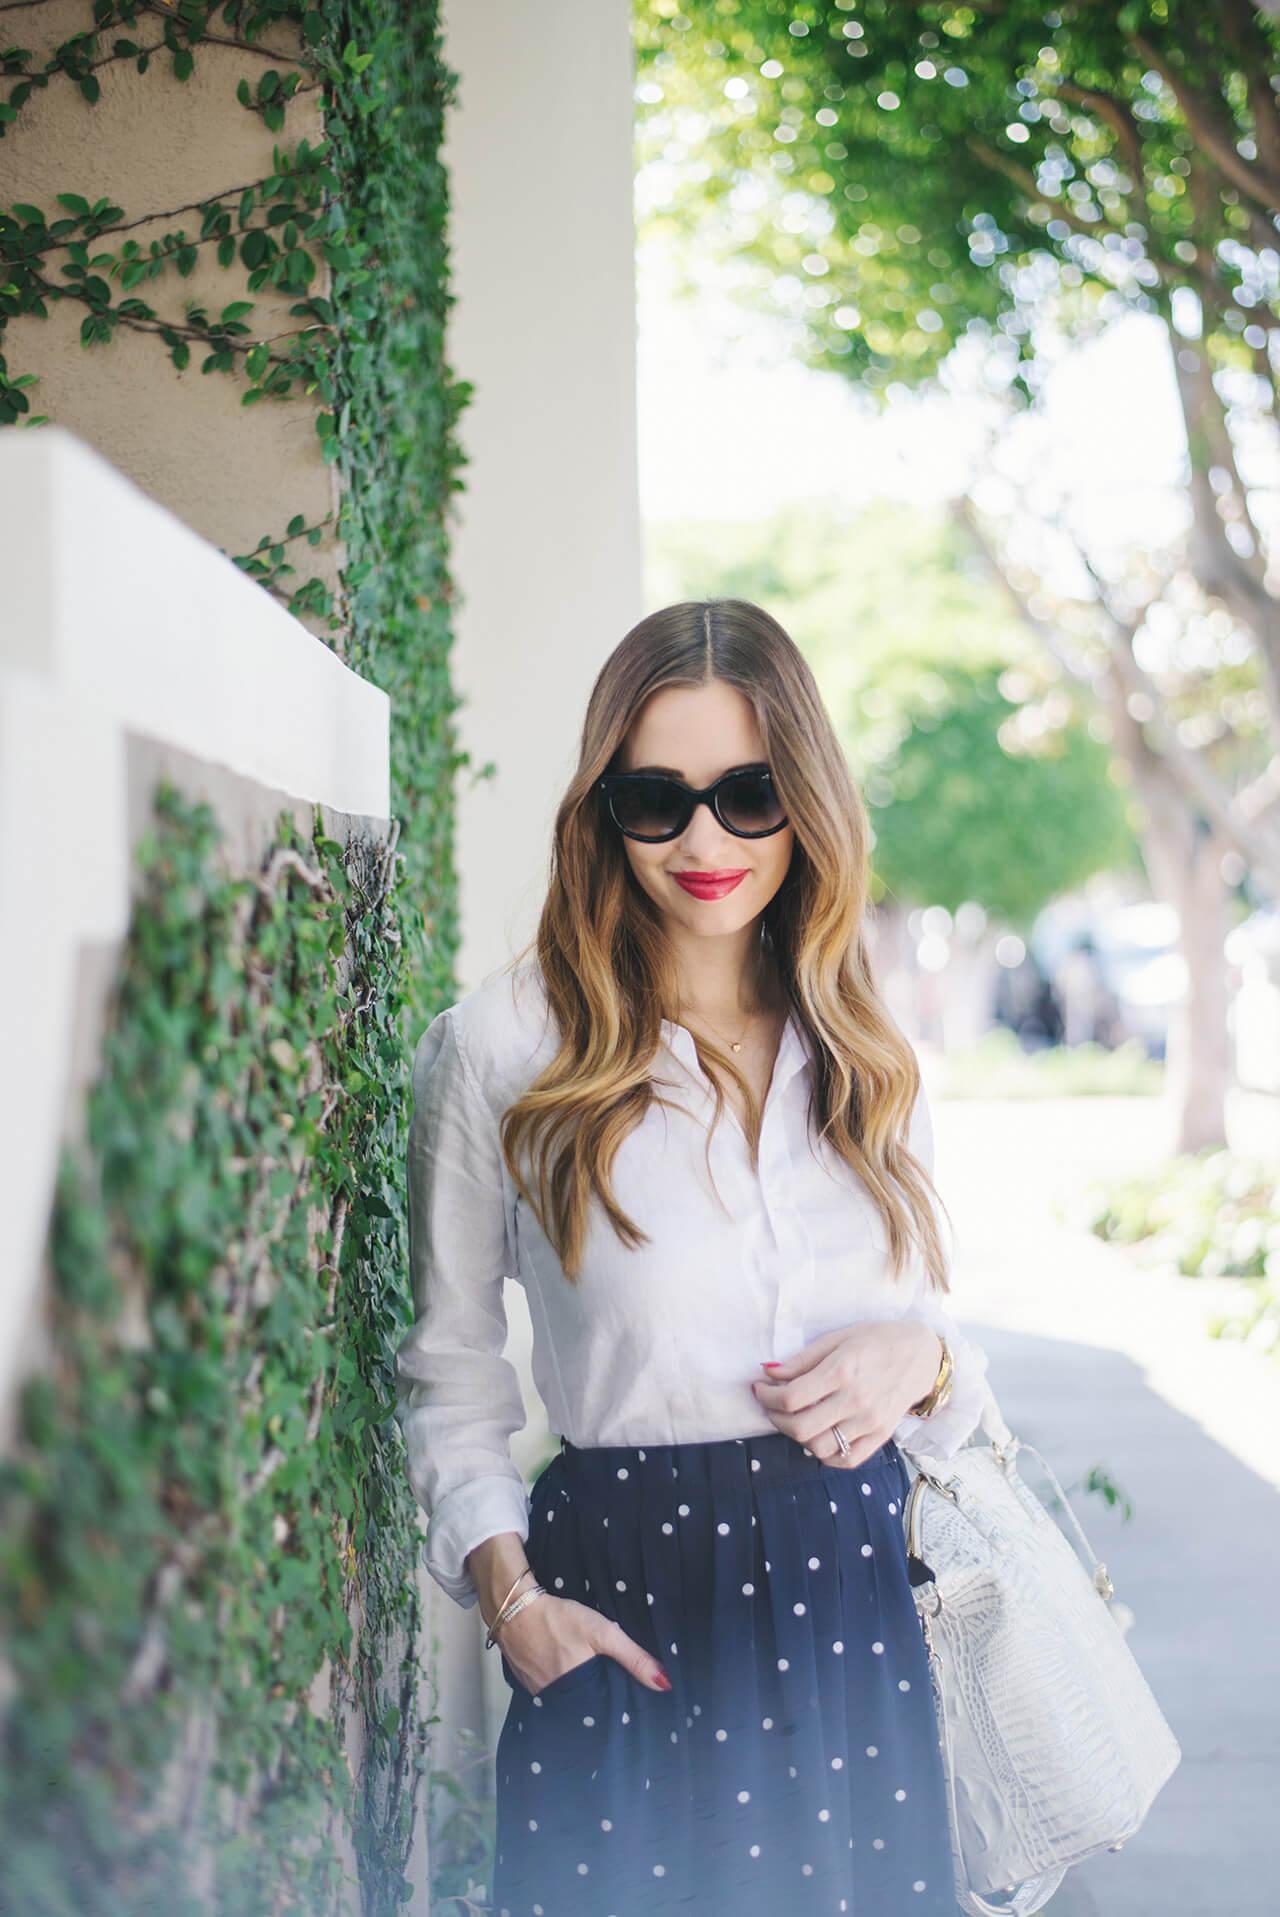 styling a white linen button-up shirt